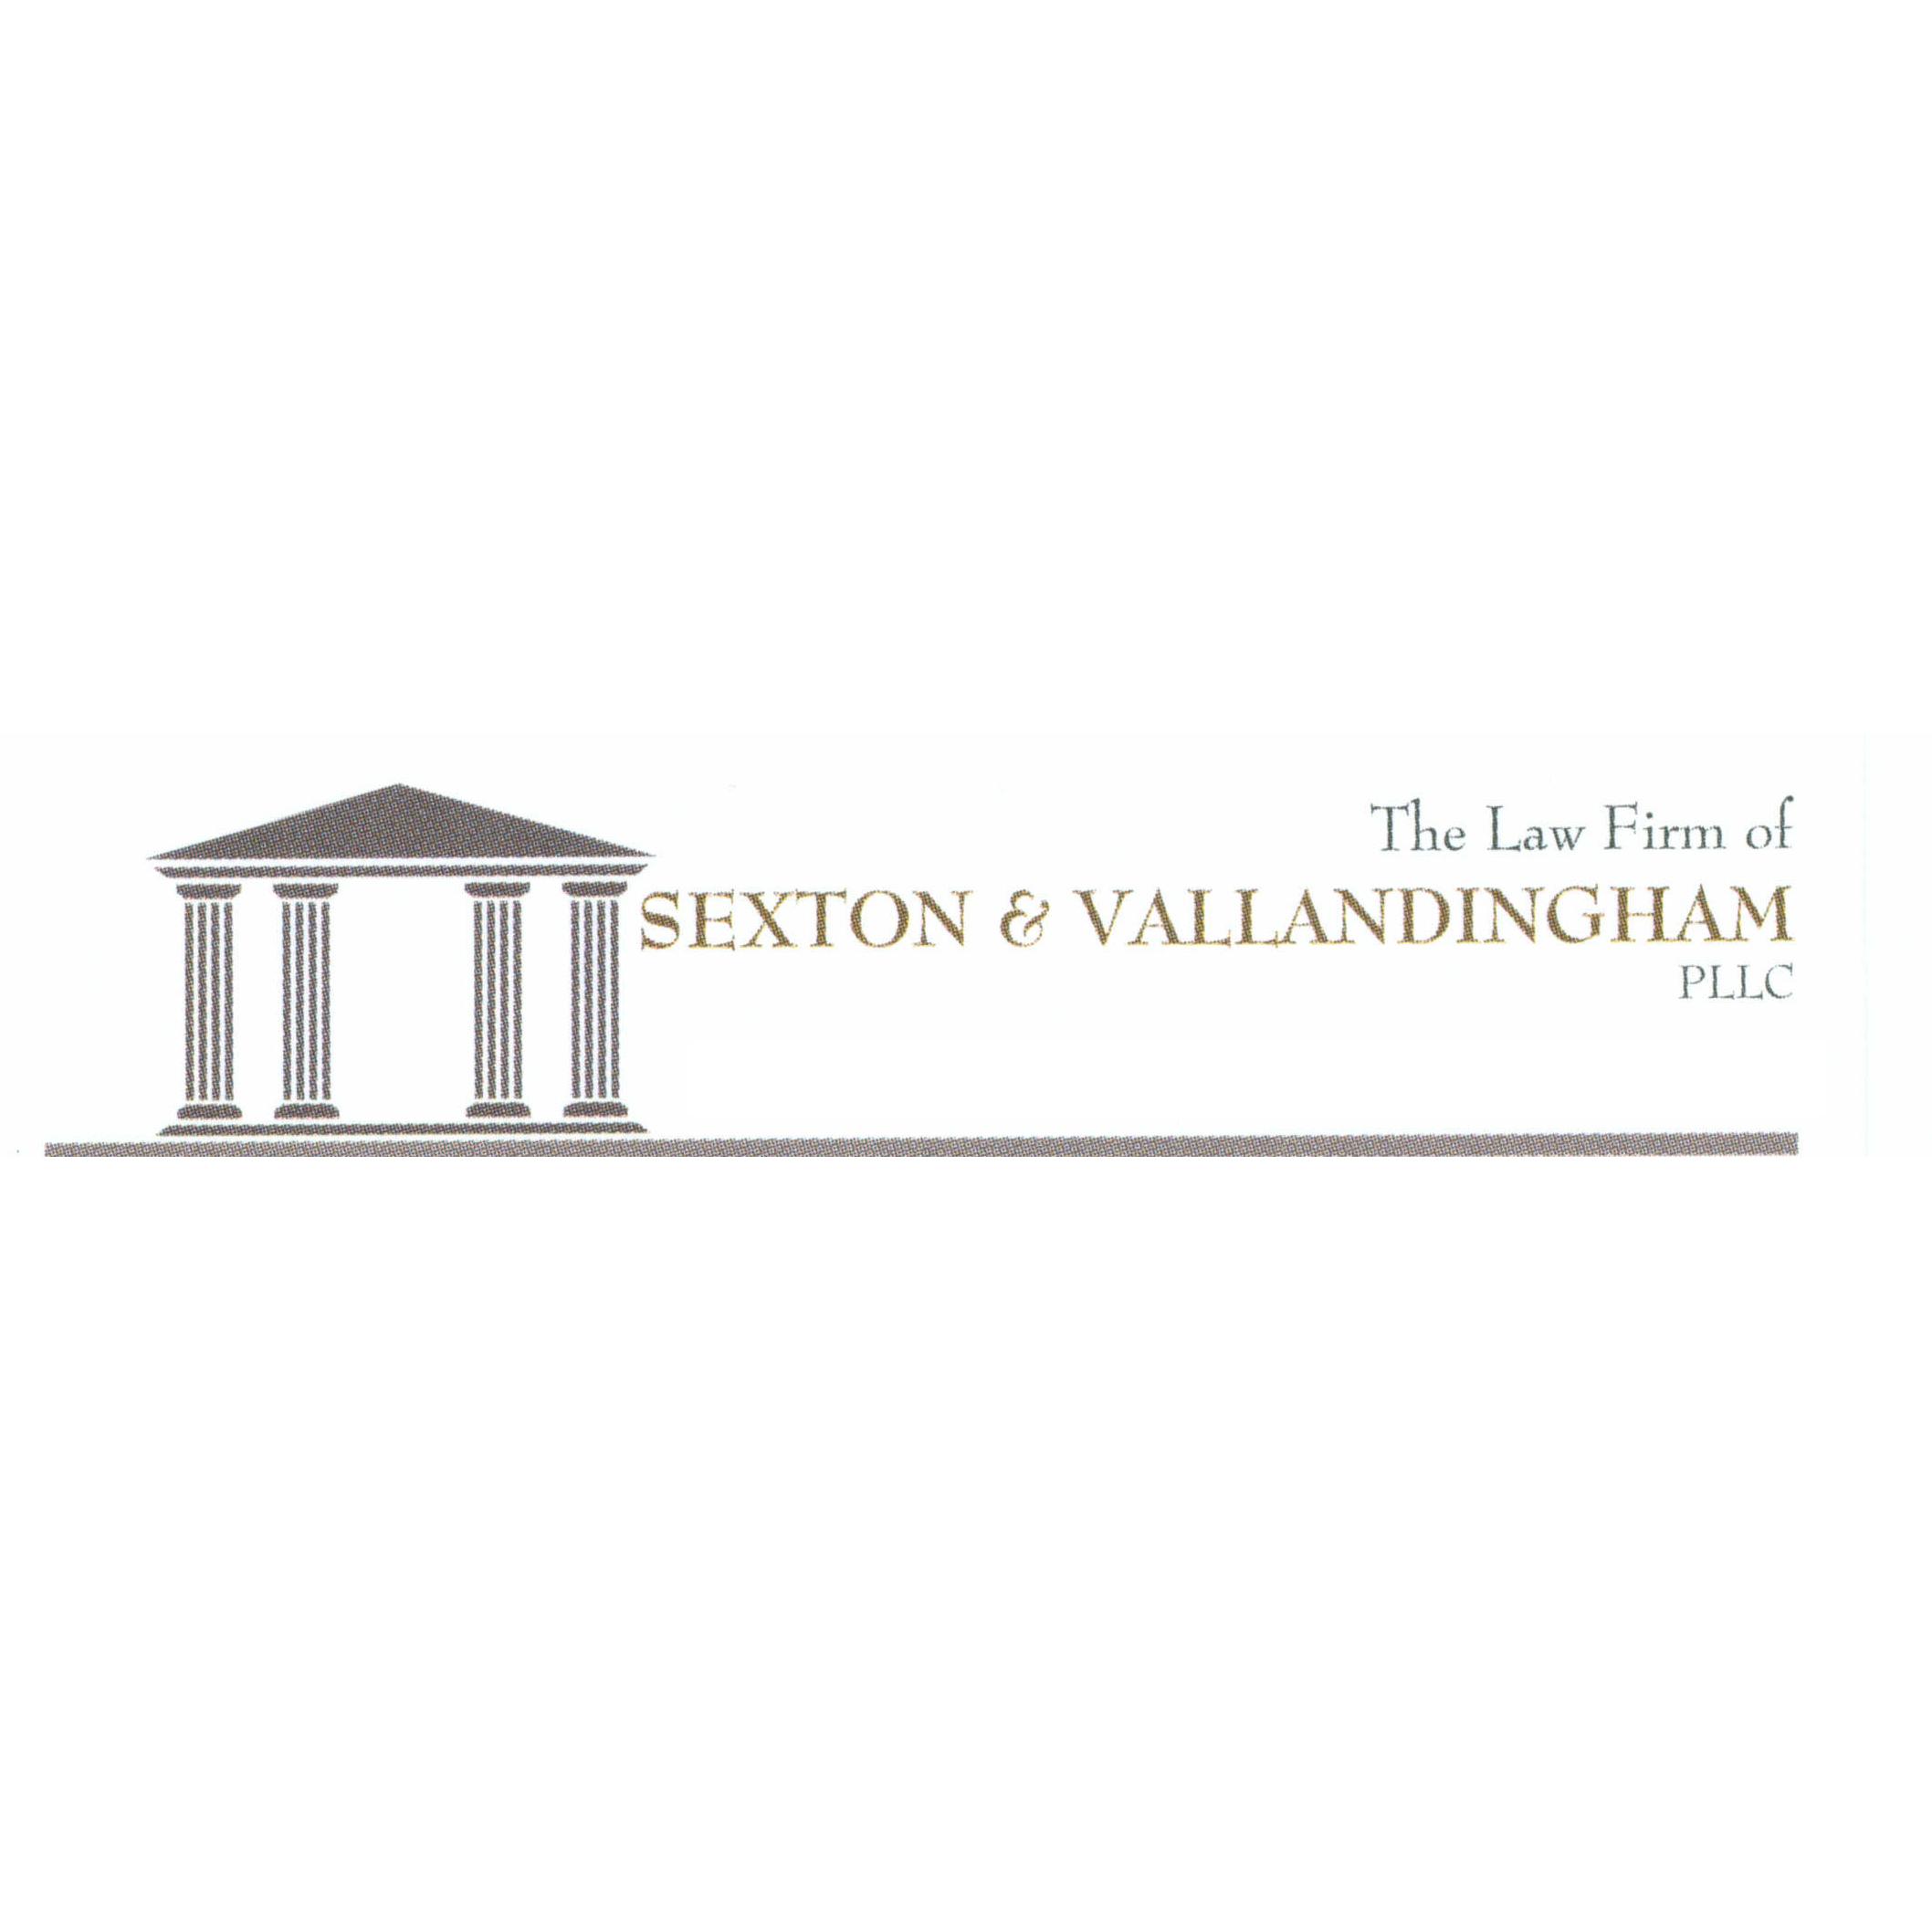 SEXTON & VALLANDINGHAM, PLLC